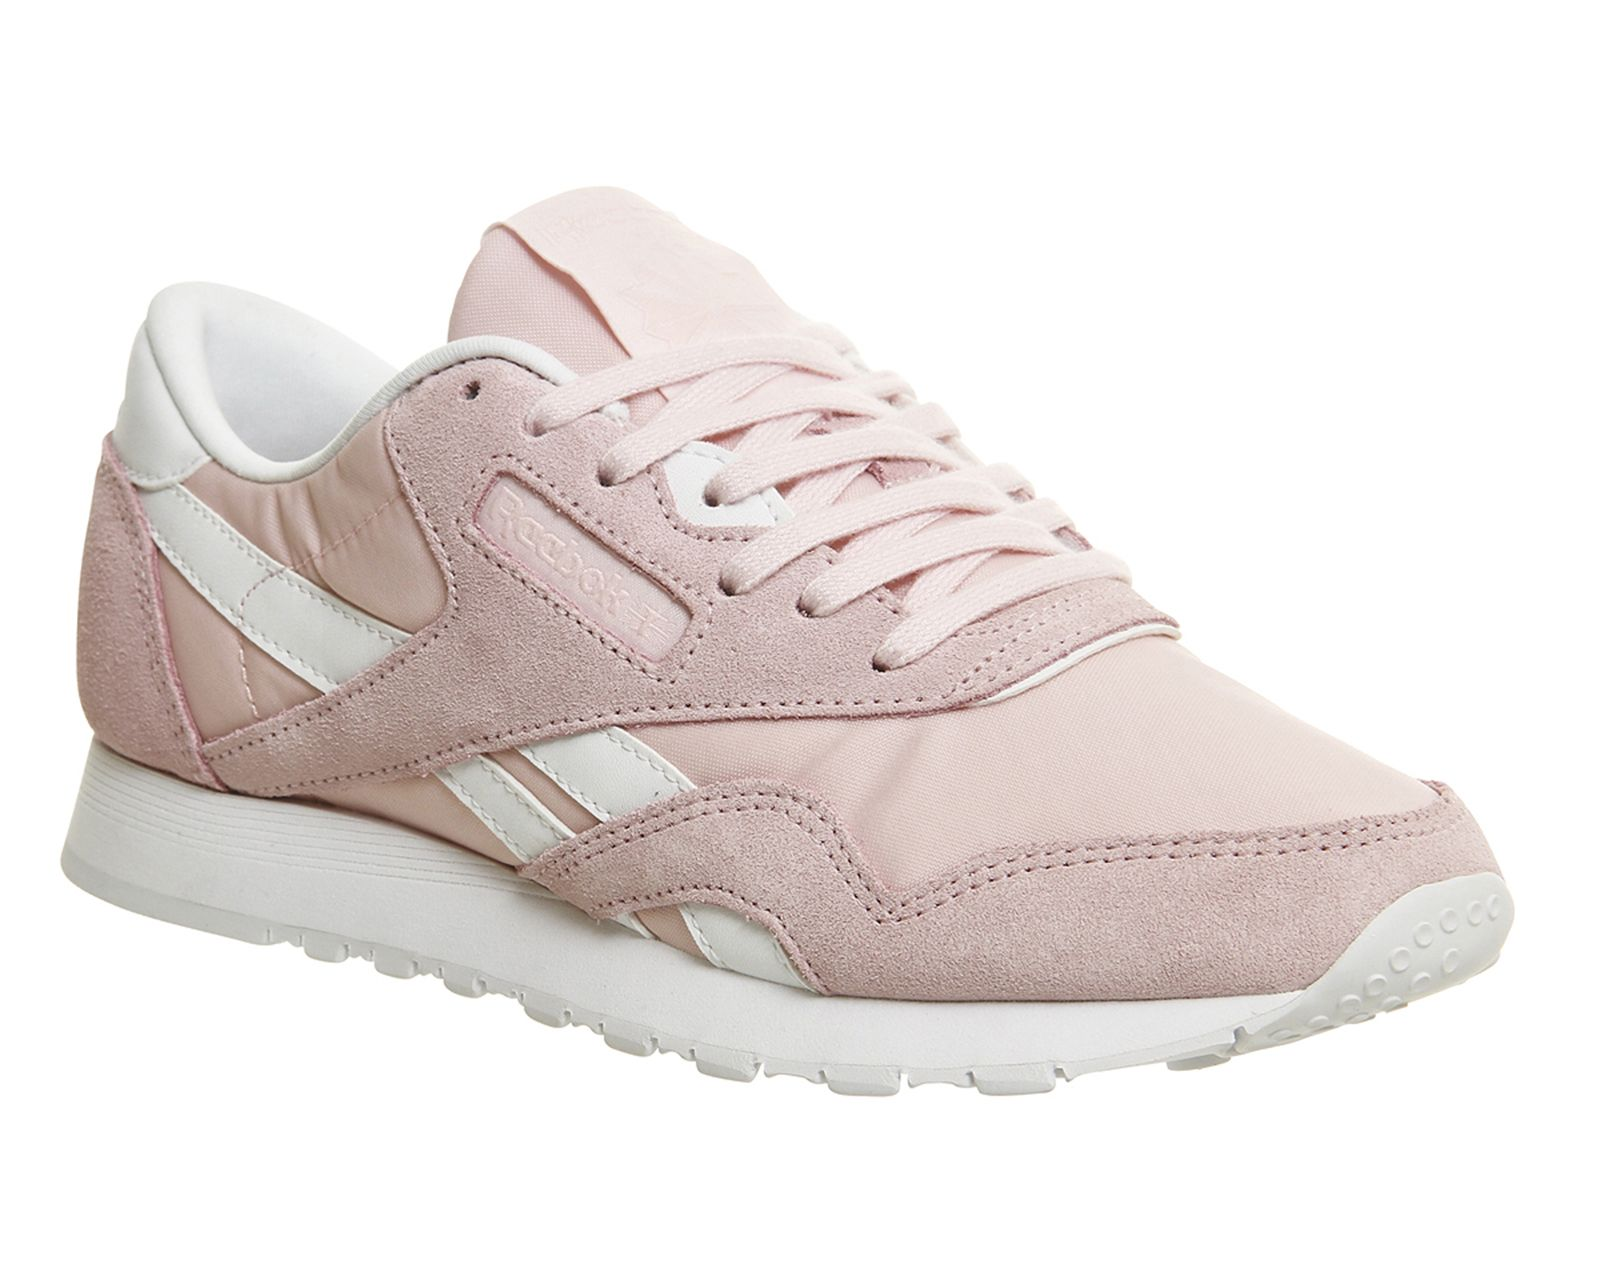 4b2ec961133a1 Buy Porcelain Pink White Reebok Cl Nylon from OFFICE.co.uk.